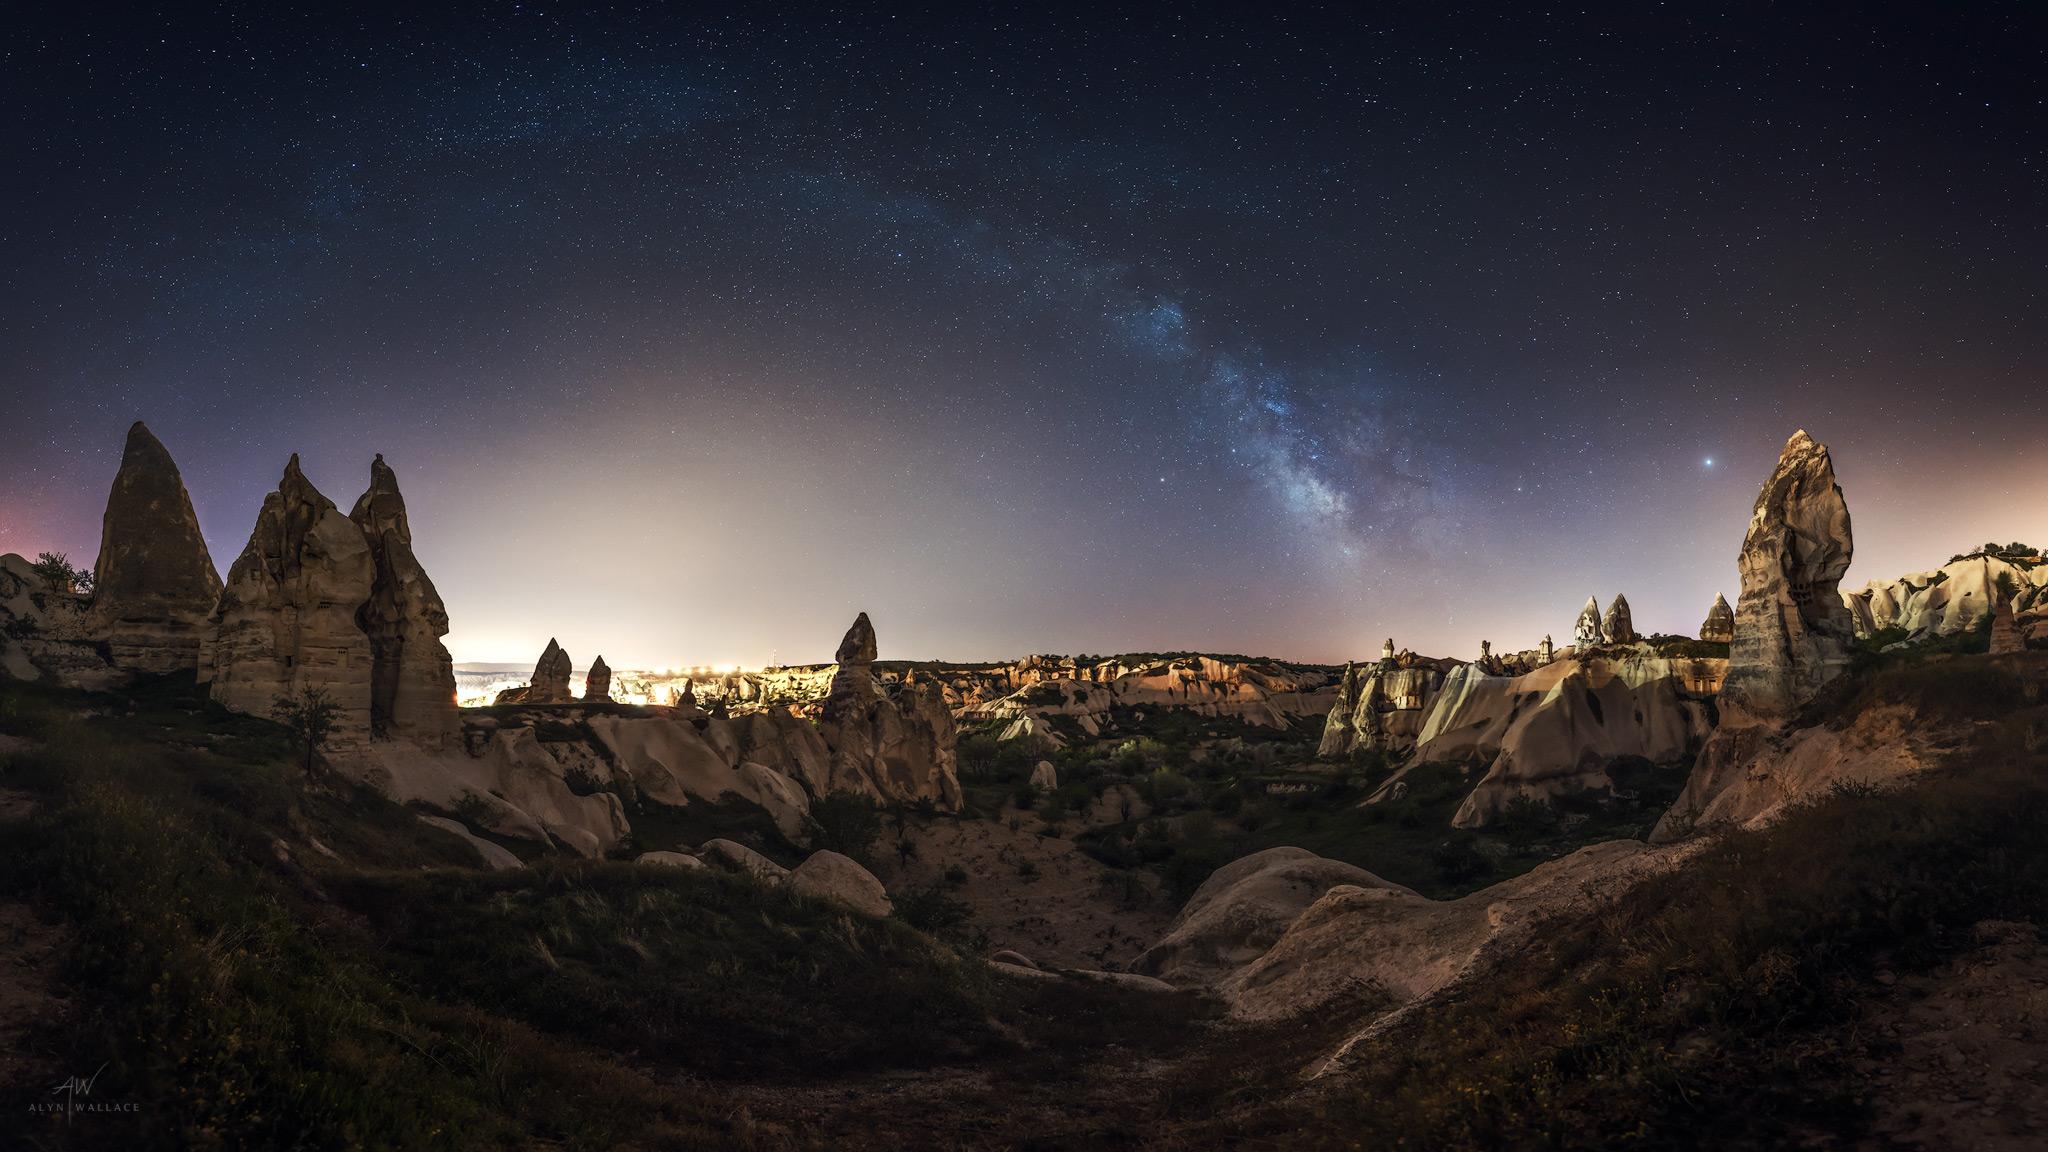 Pigeon-Valley-Panorama-Cappadocia-Milky-Way.jpg